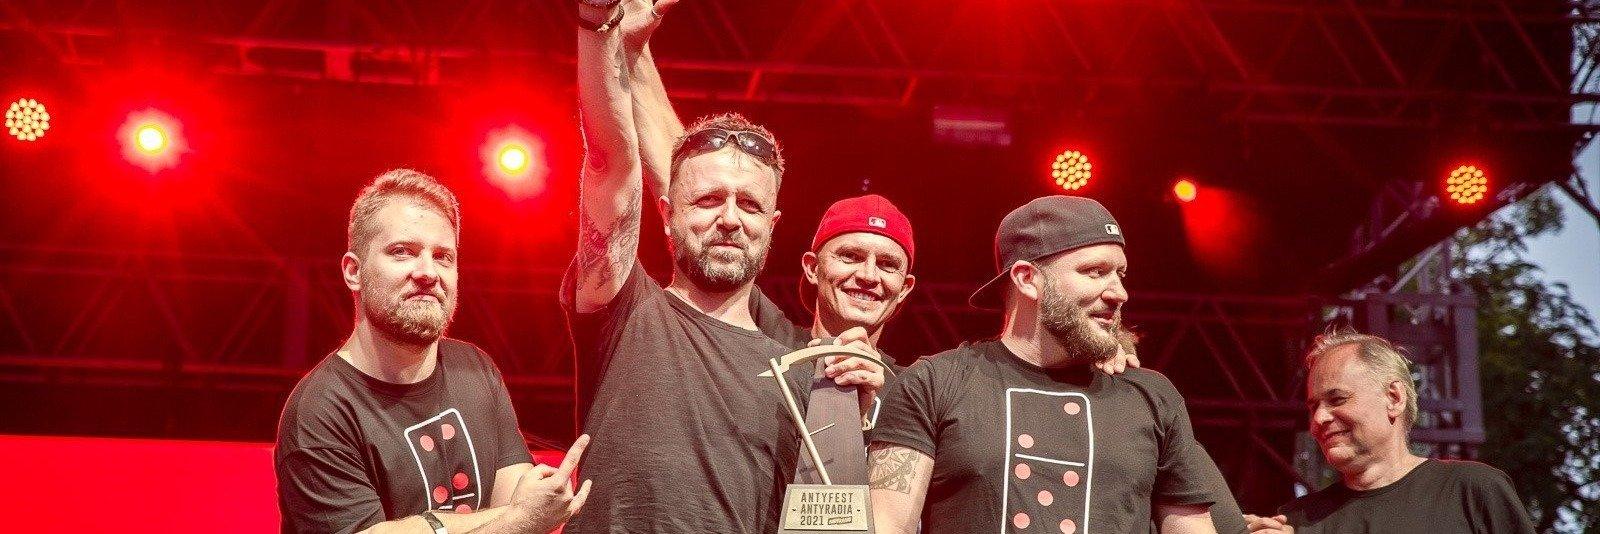 Laureat Antyfestu Antyradia - Batna zagra na 27. Pol'and'Rock Festival